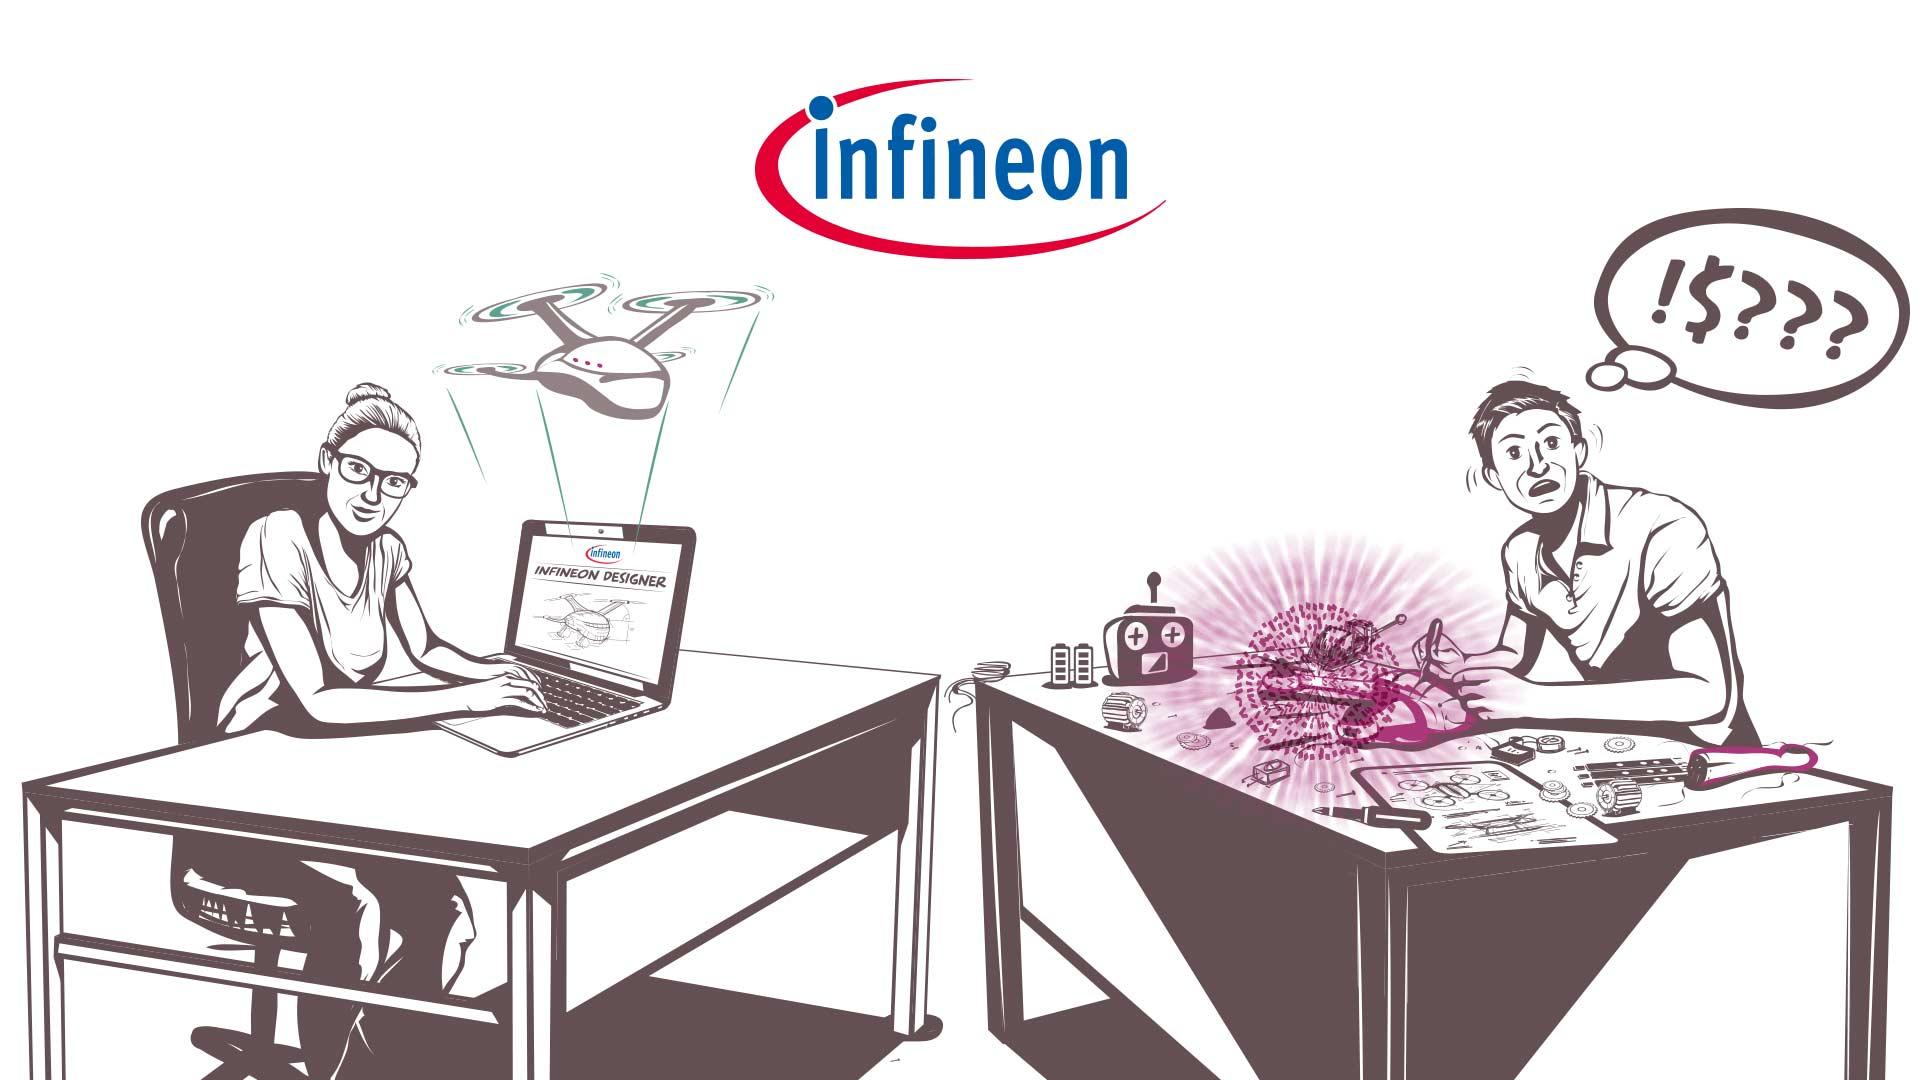 Infineon Designer